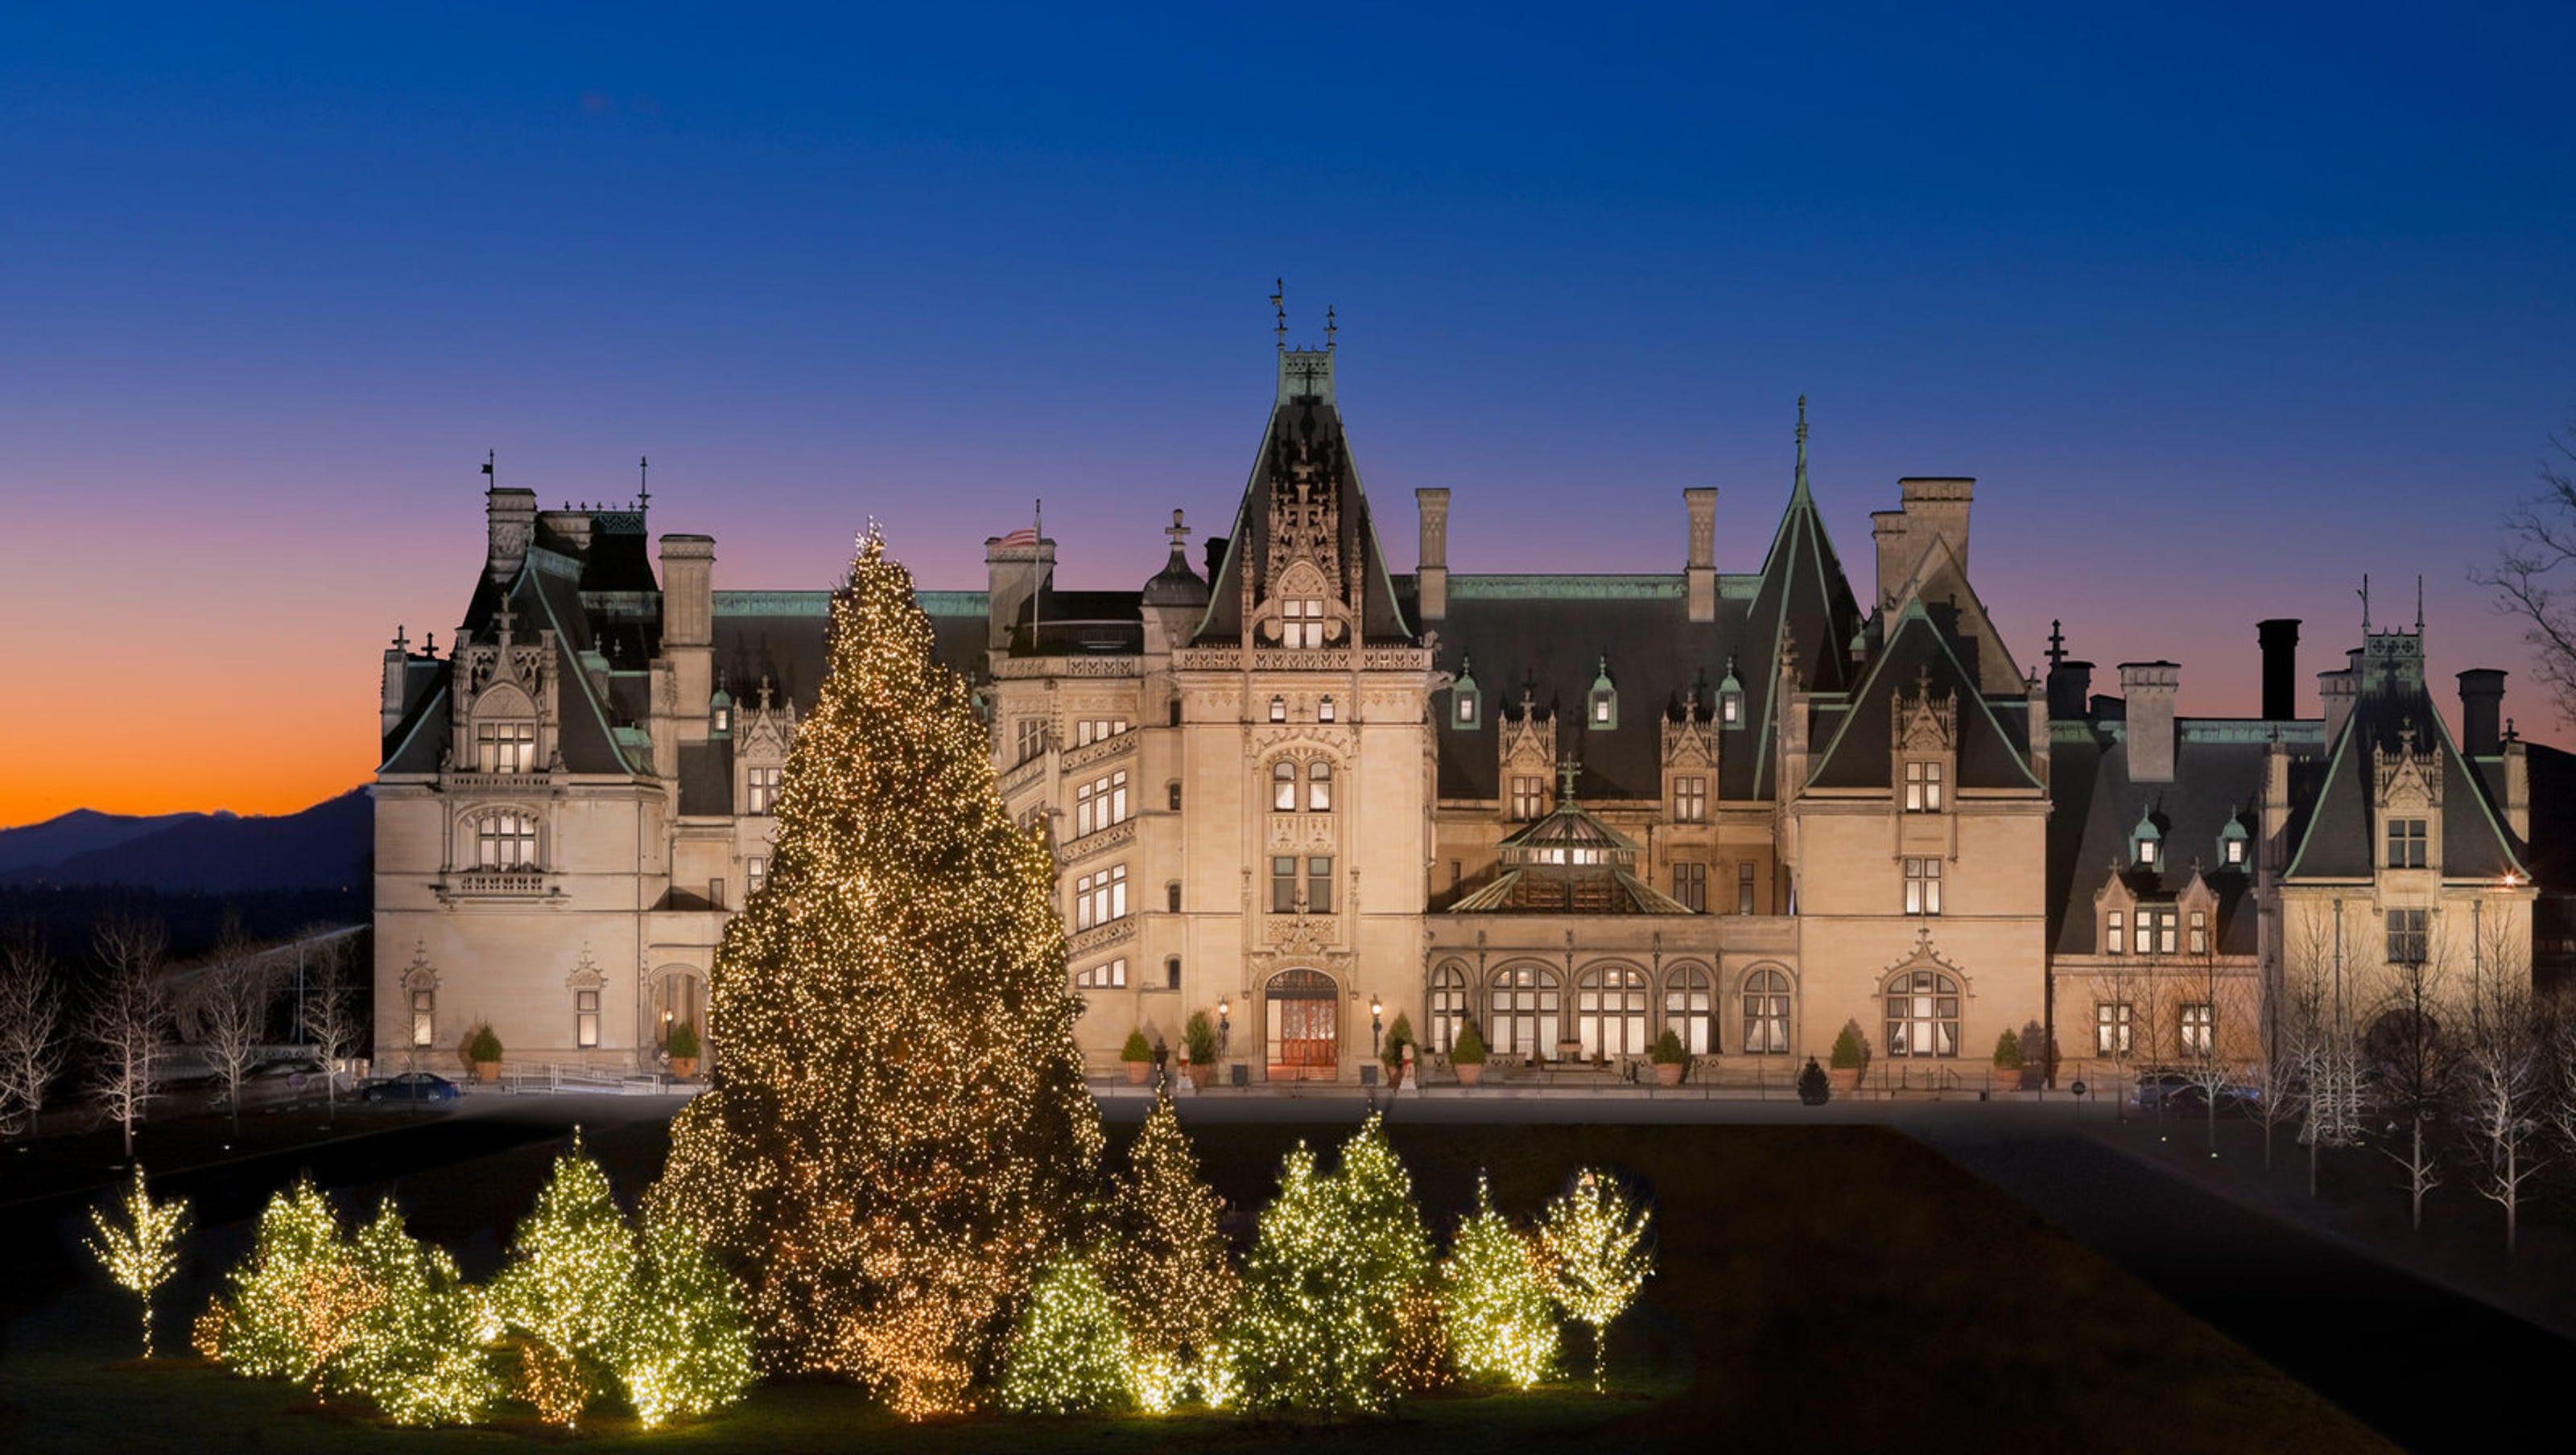 Candlelight Christmas Savings At Biltmore Estates